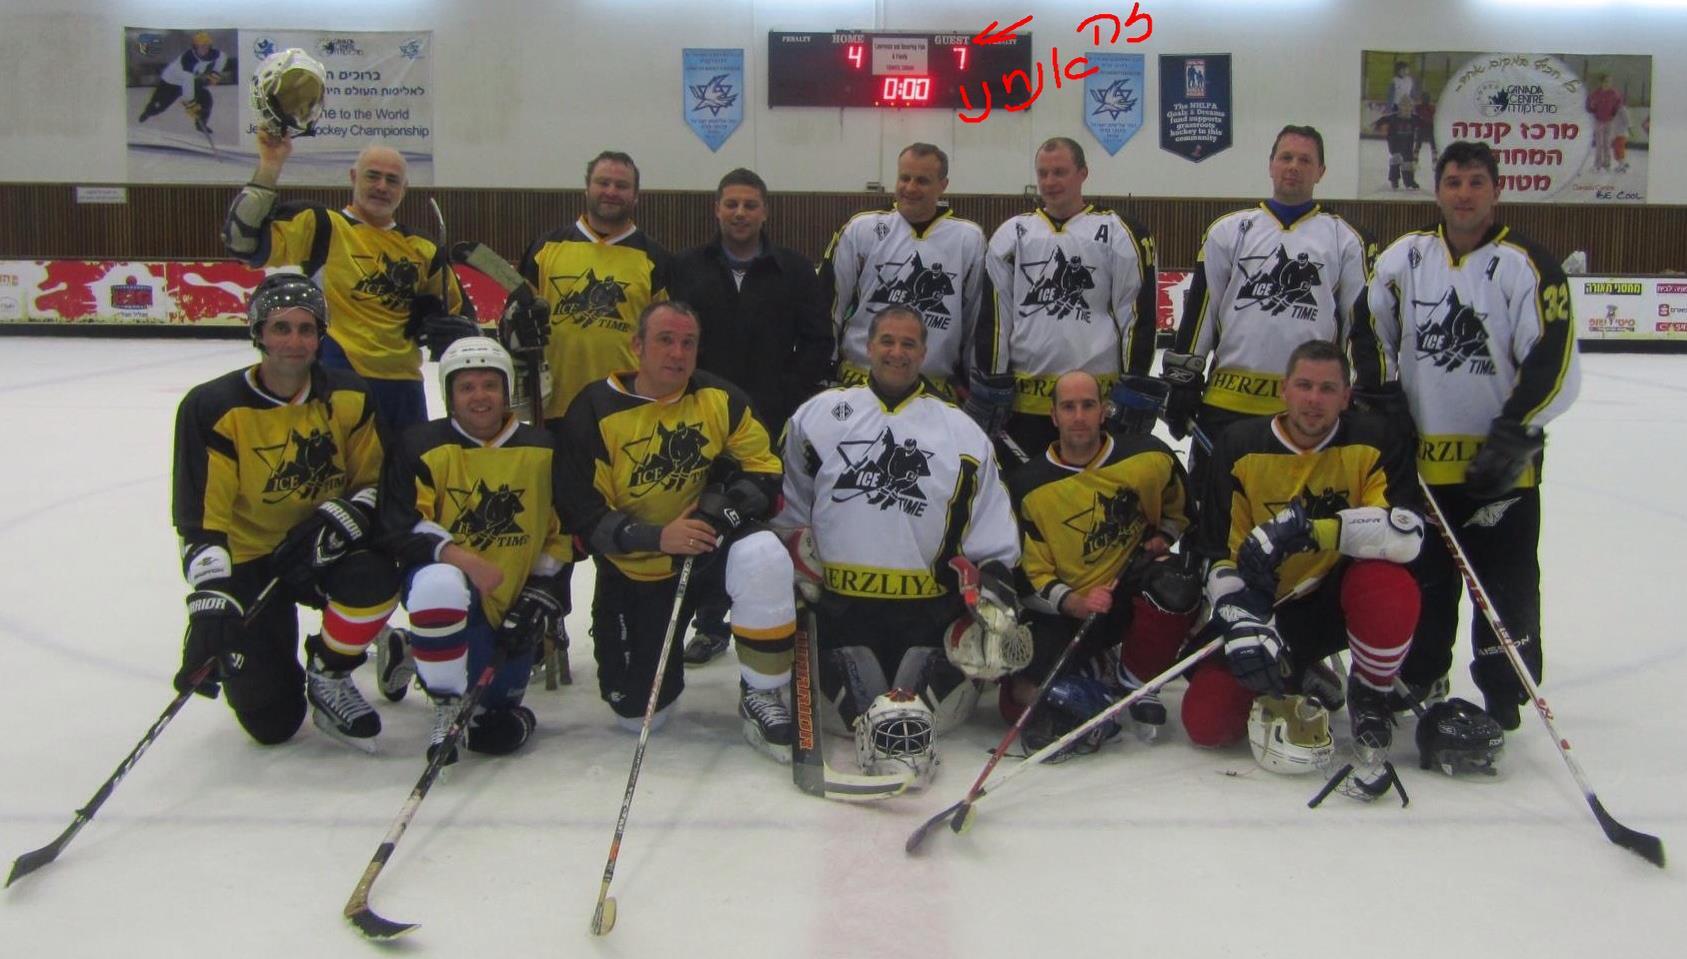 Hertzelia Ice Time נגד Canada Israel Hockey School